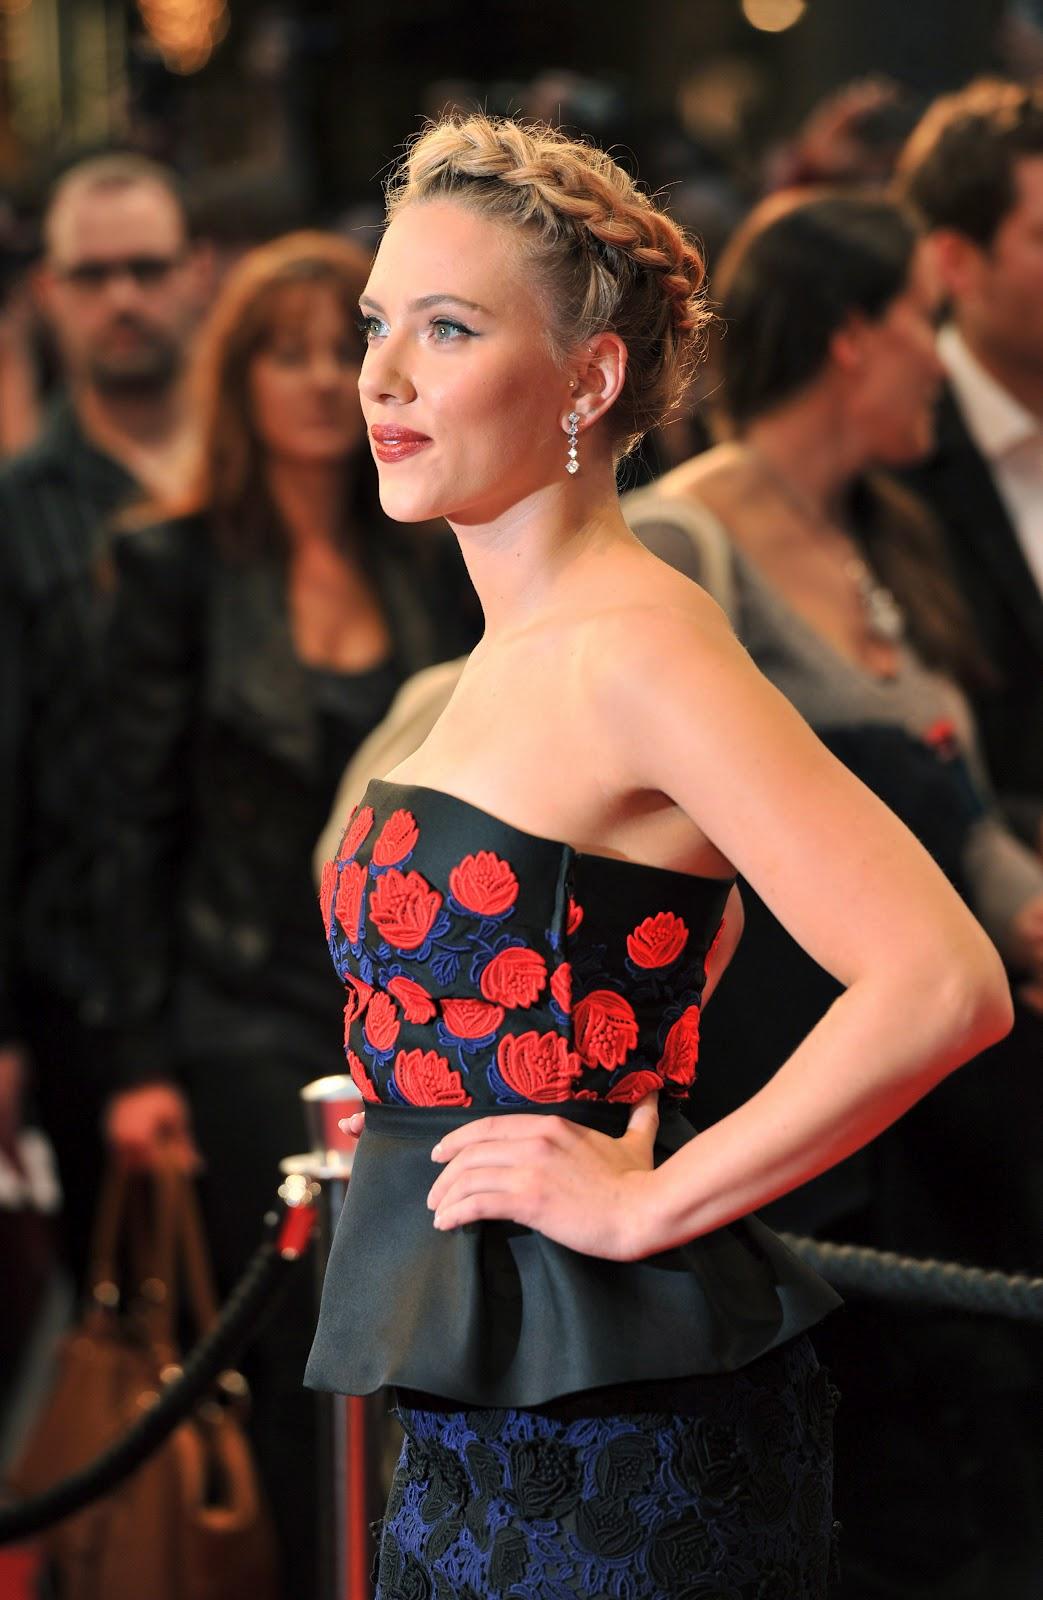 Scarlett johansson pictures gallery 2 film actresses - Scarlett johansson blogspot ...